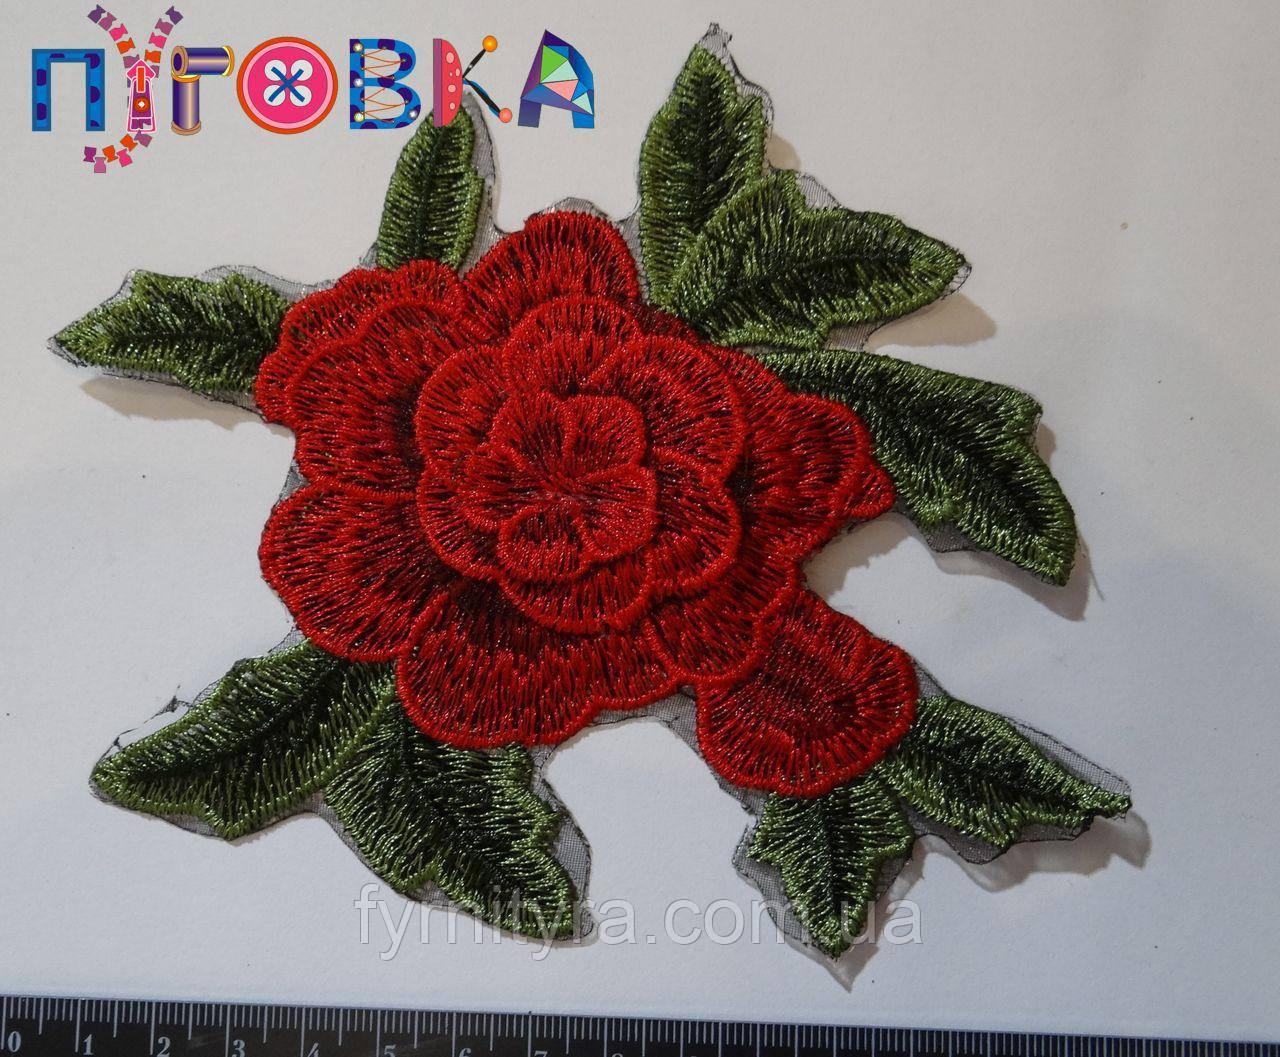 Аппликация термоклеевая 3D цветок 1506